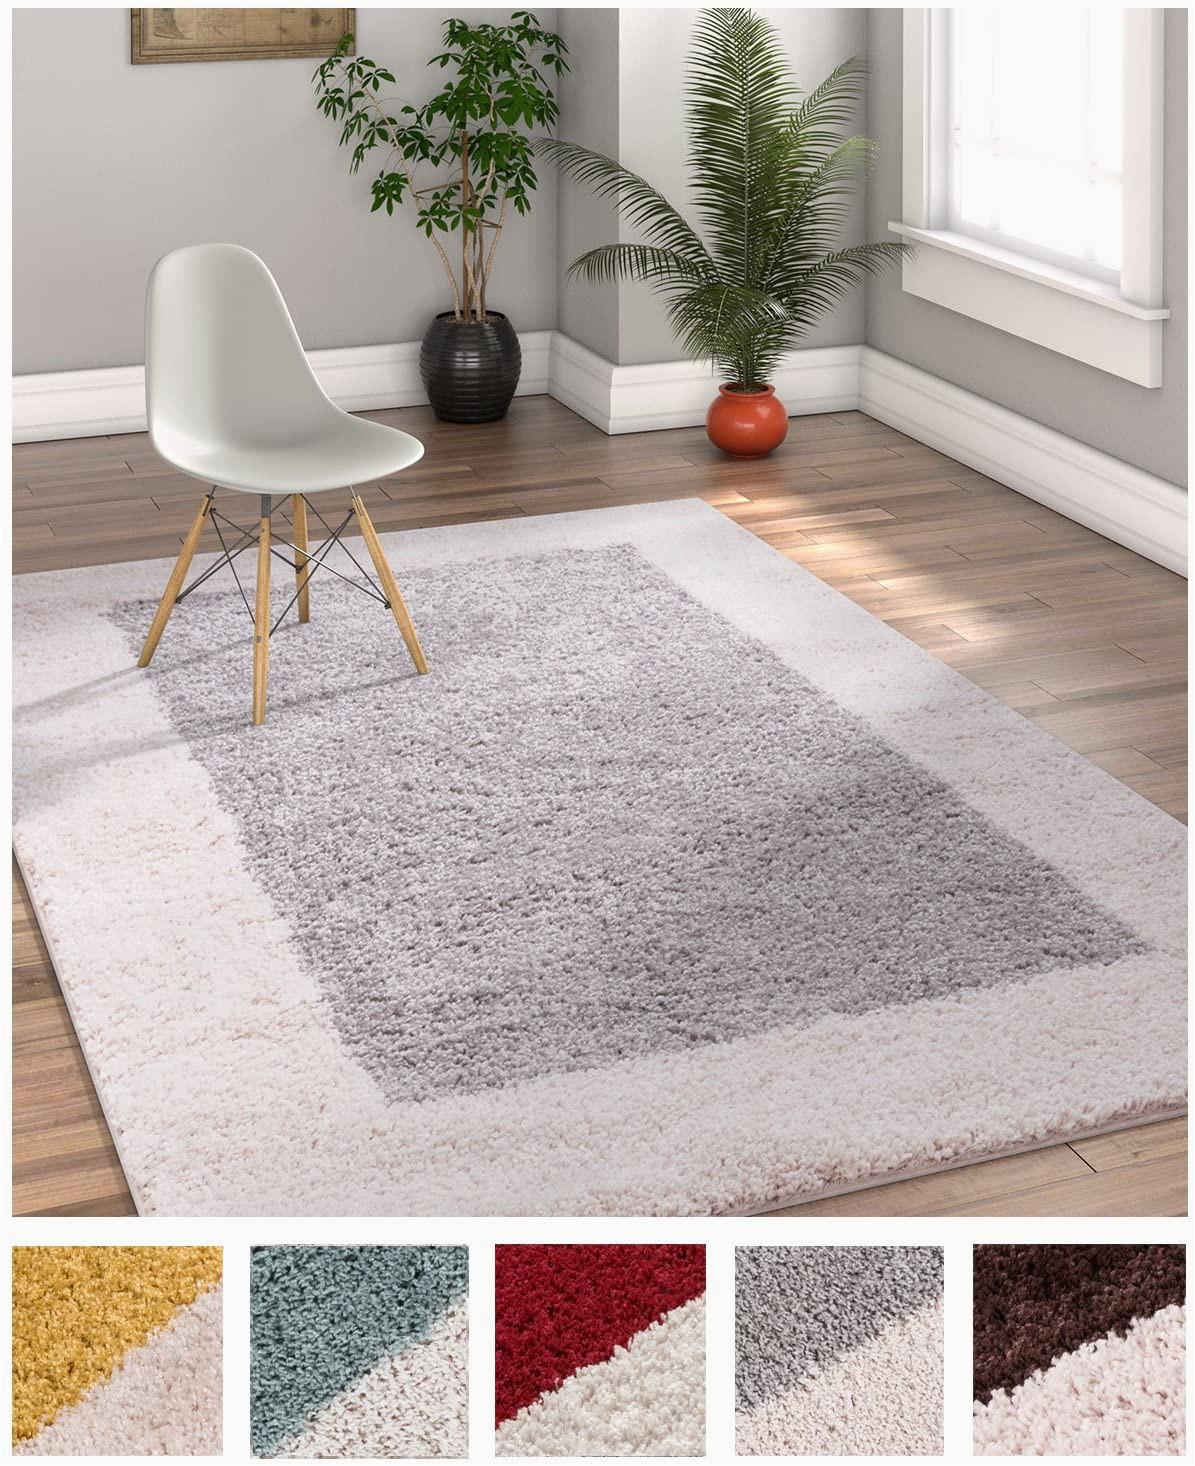 Dark Grey area Rug 5×7 Porta Border Modern Geometric Shag 5×7 5 X 7 2 area Rug Greybeige Plush Easy Care Thick soft Plush Living Room